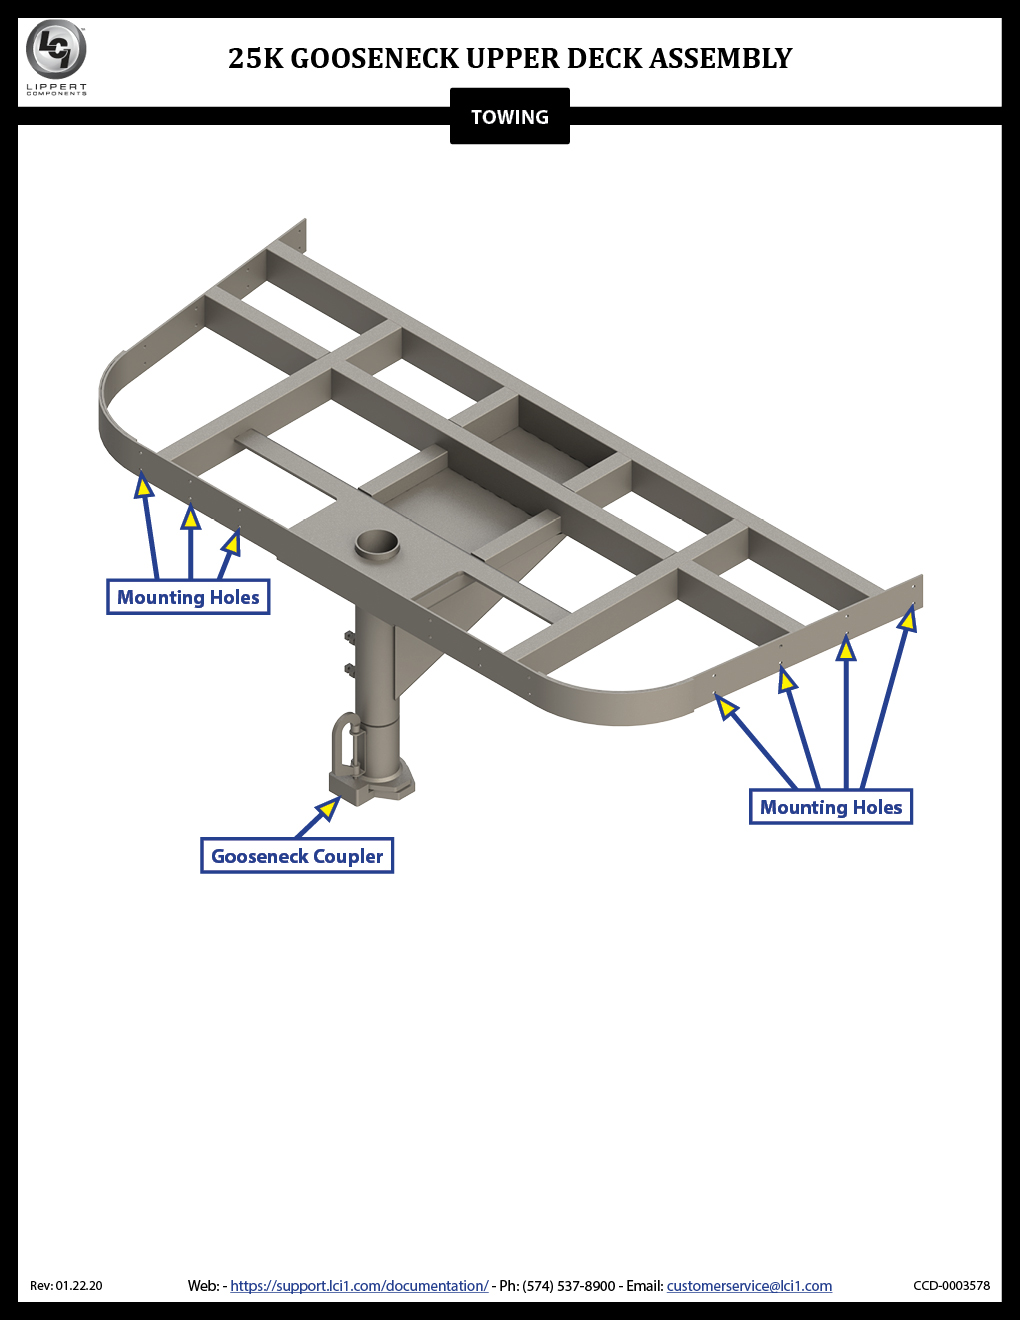 25K Gooseneck Upper Deck Assembly